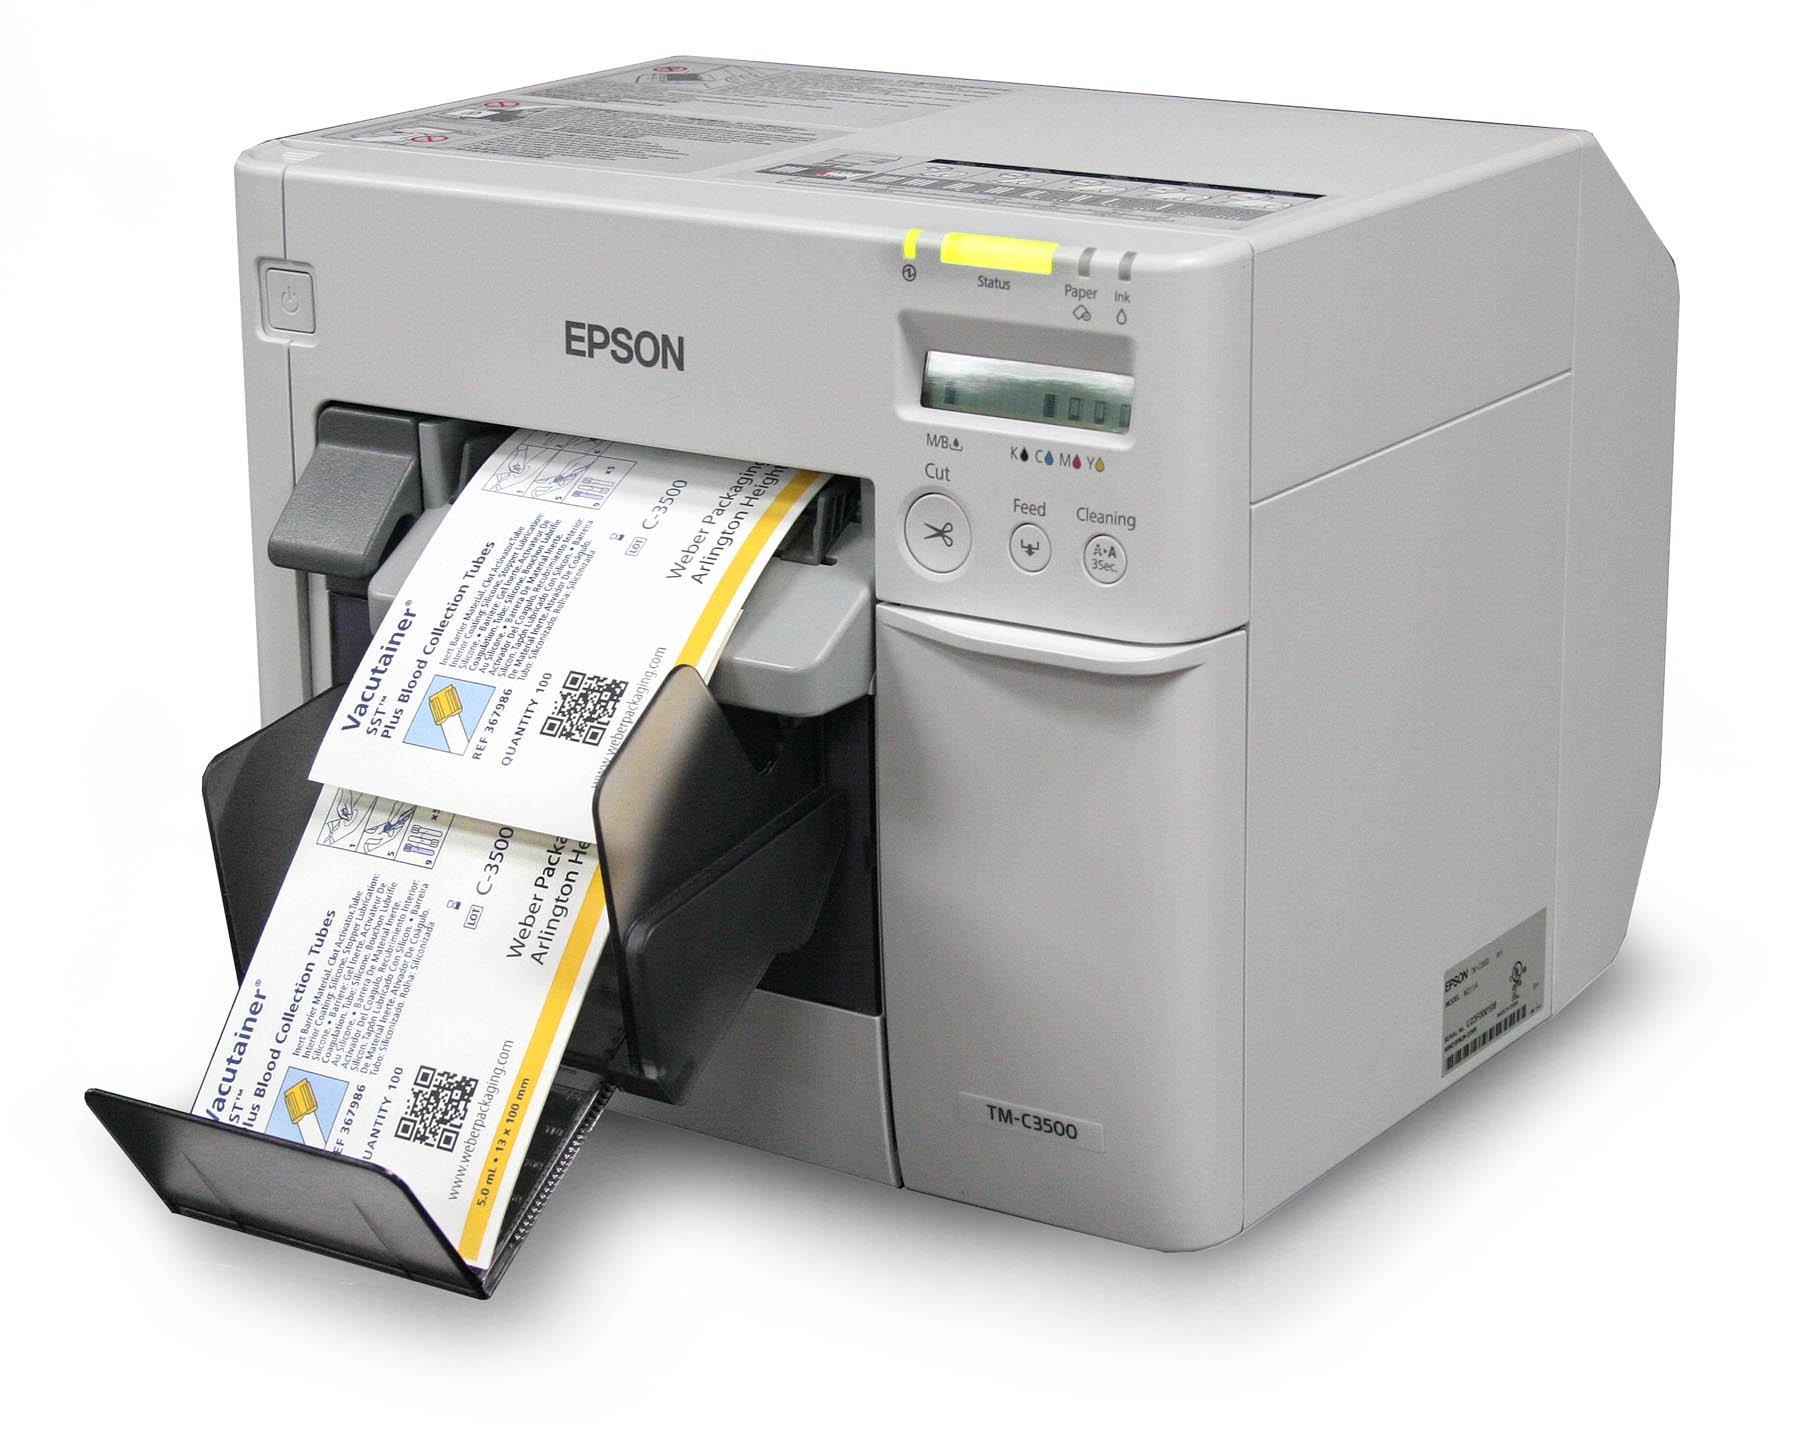 Epson SecurColor Inkjet Label Printer For On Demand High